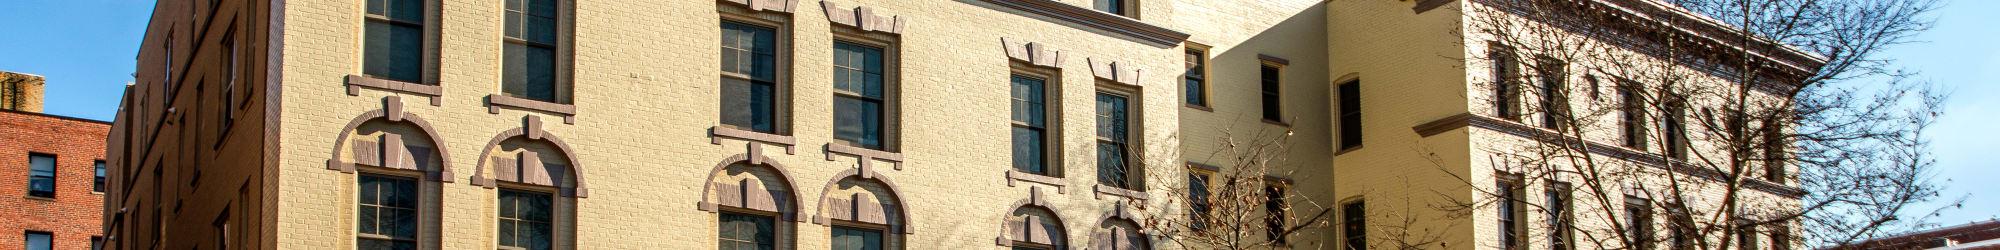 Directions to Monsenor Romero Apartments in Washington, District of Columbia